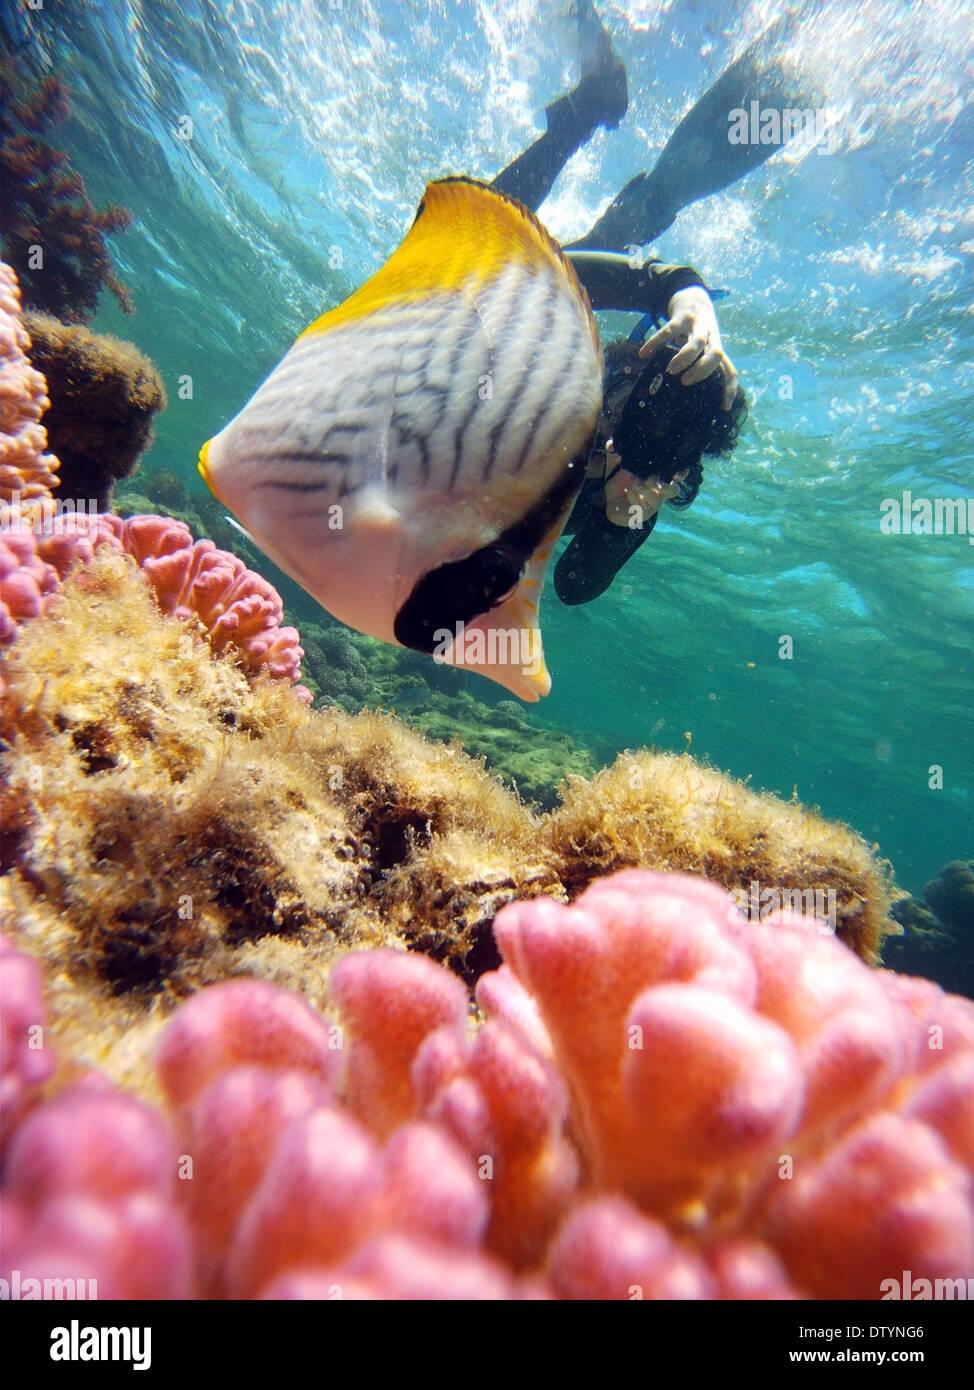 Snorkeller photographing butterflyfish, Little Salmon Bay, Rottnest Island, Western Australia. No MR Stock Photo